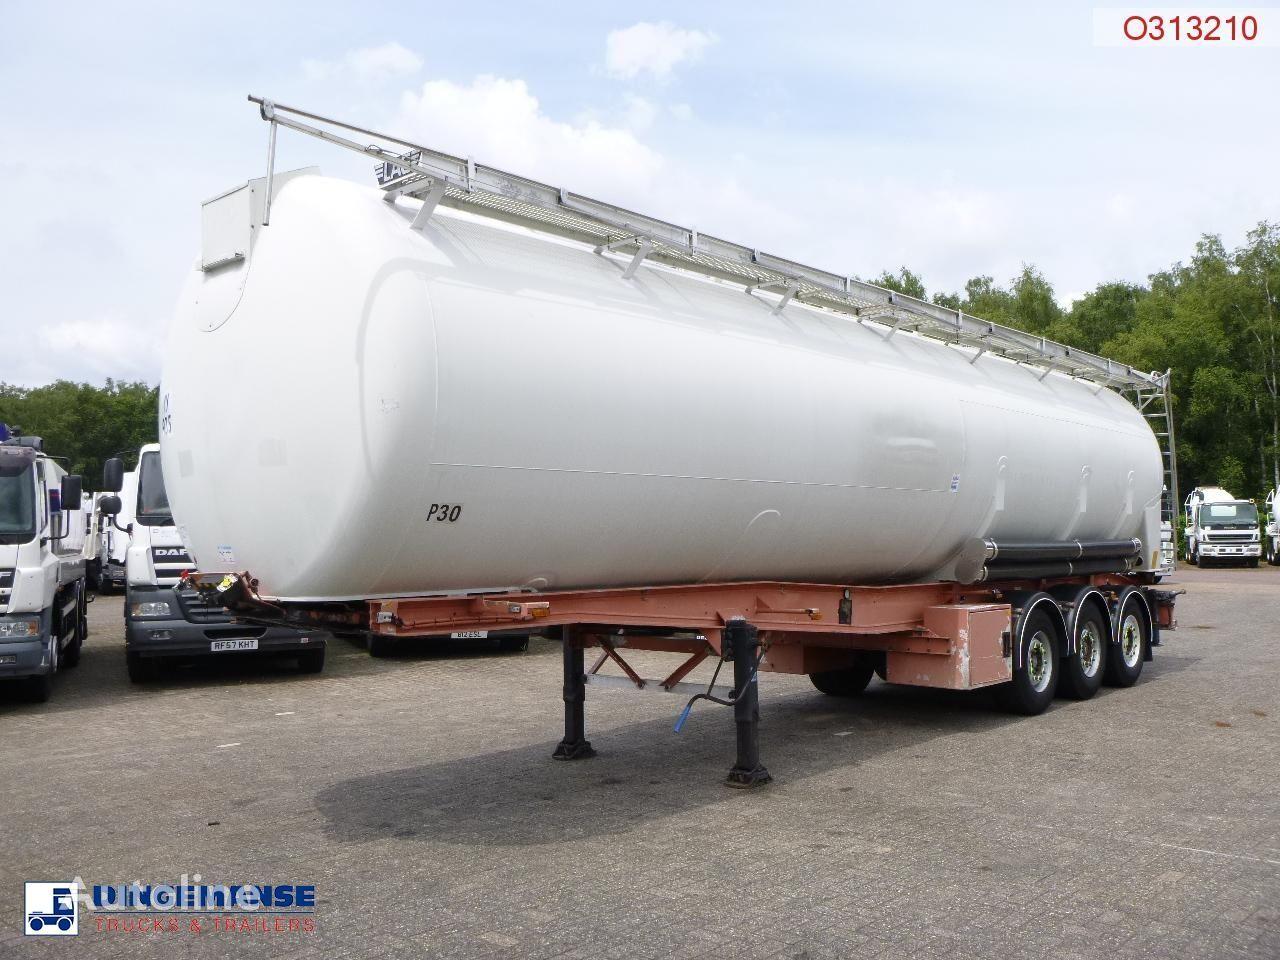 LAG Powder tank alu 60.5 m3 (tipping) silo tank trailer